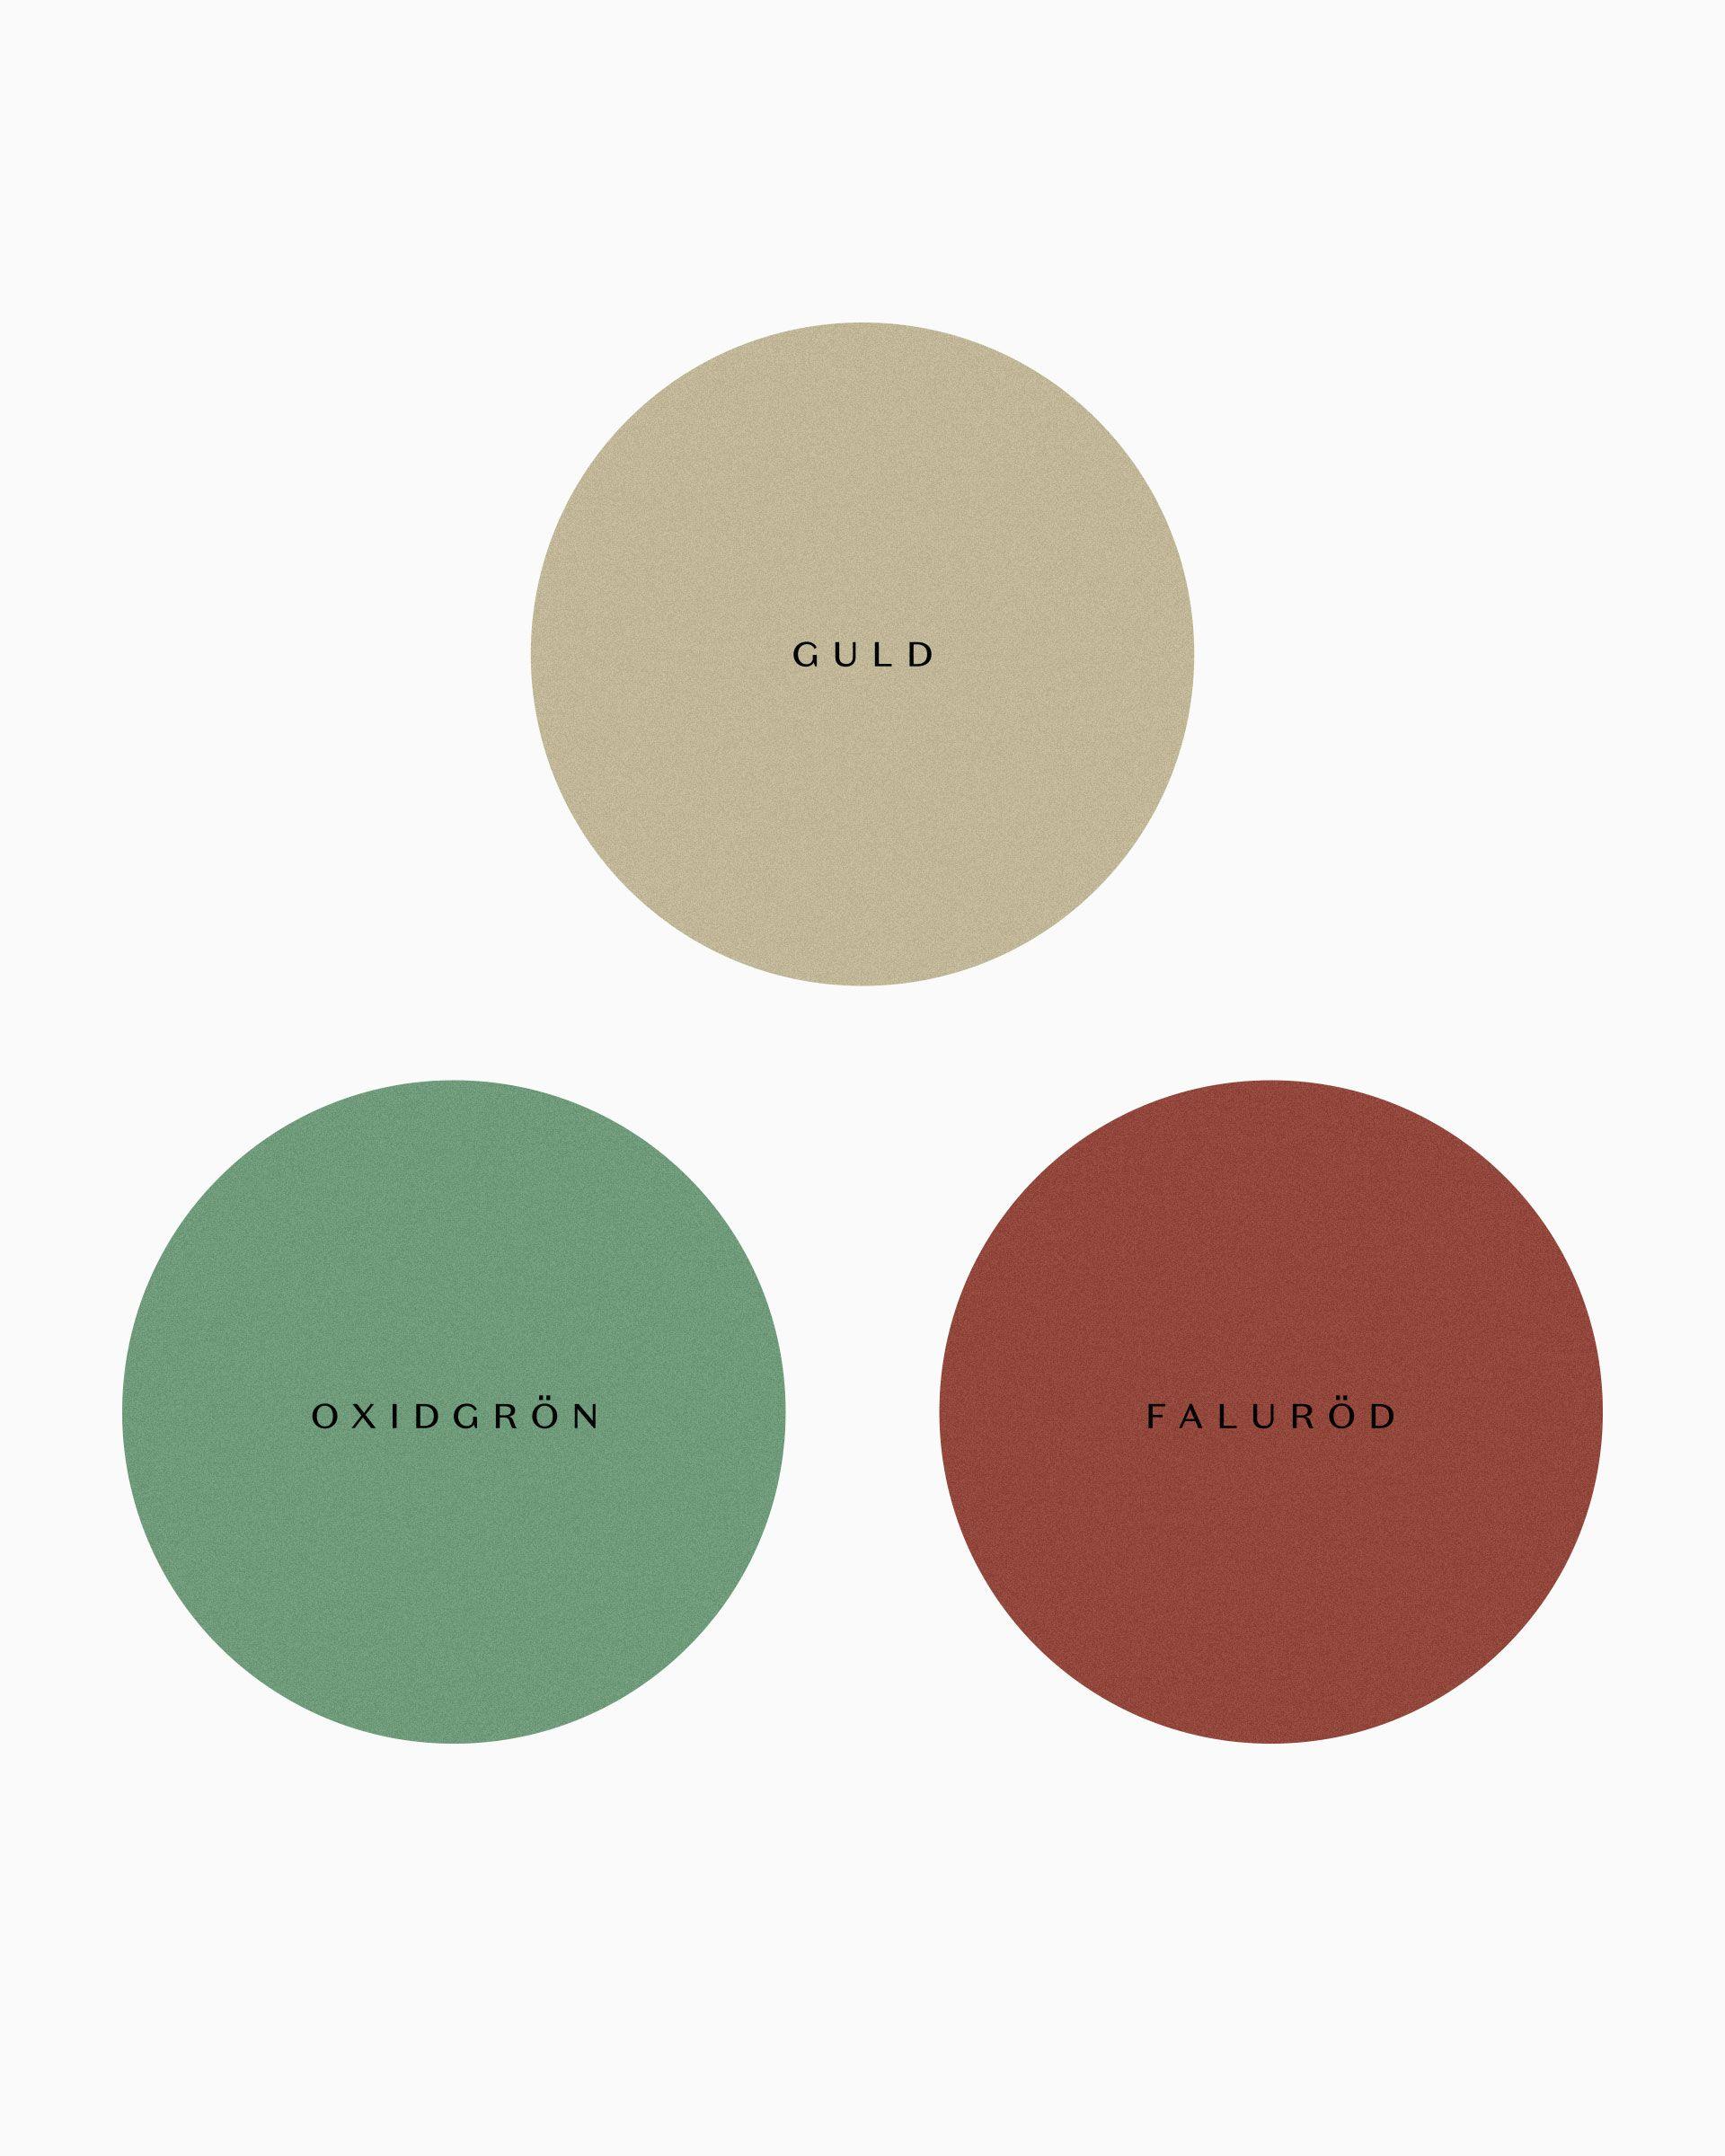 Pin by Bedow Design Studio on Identity & Branding